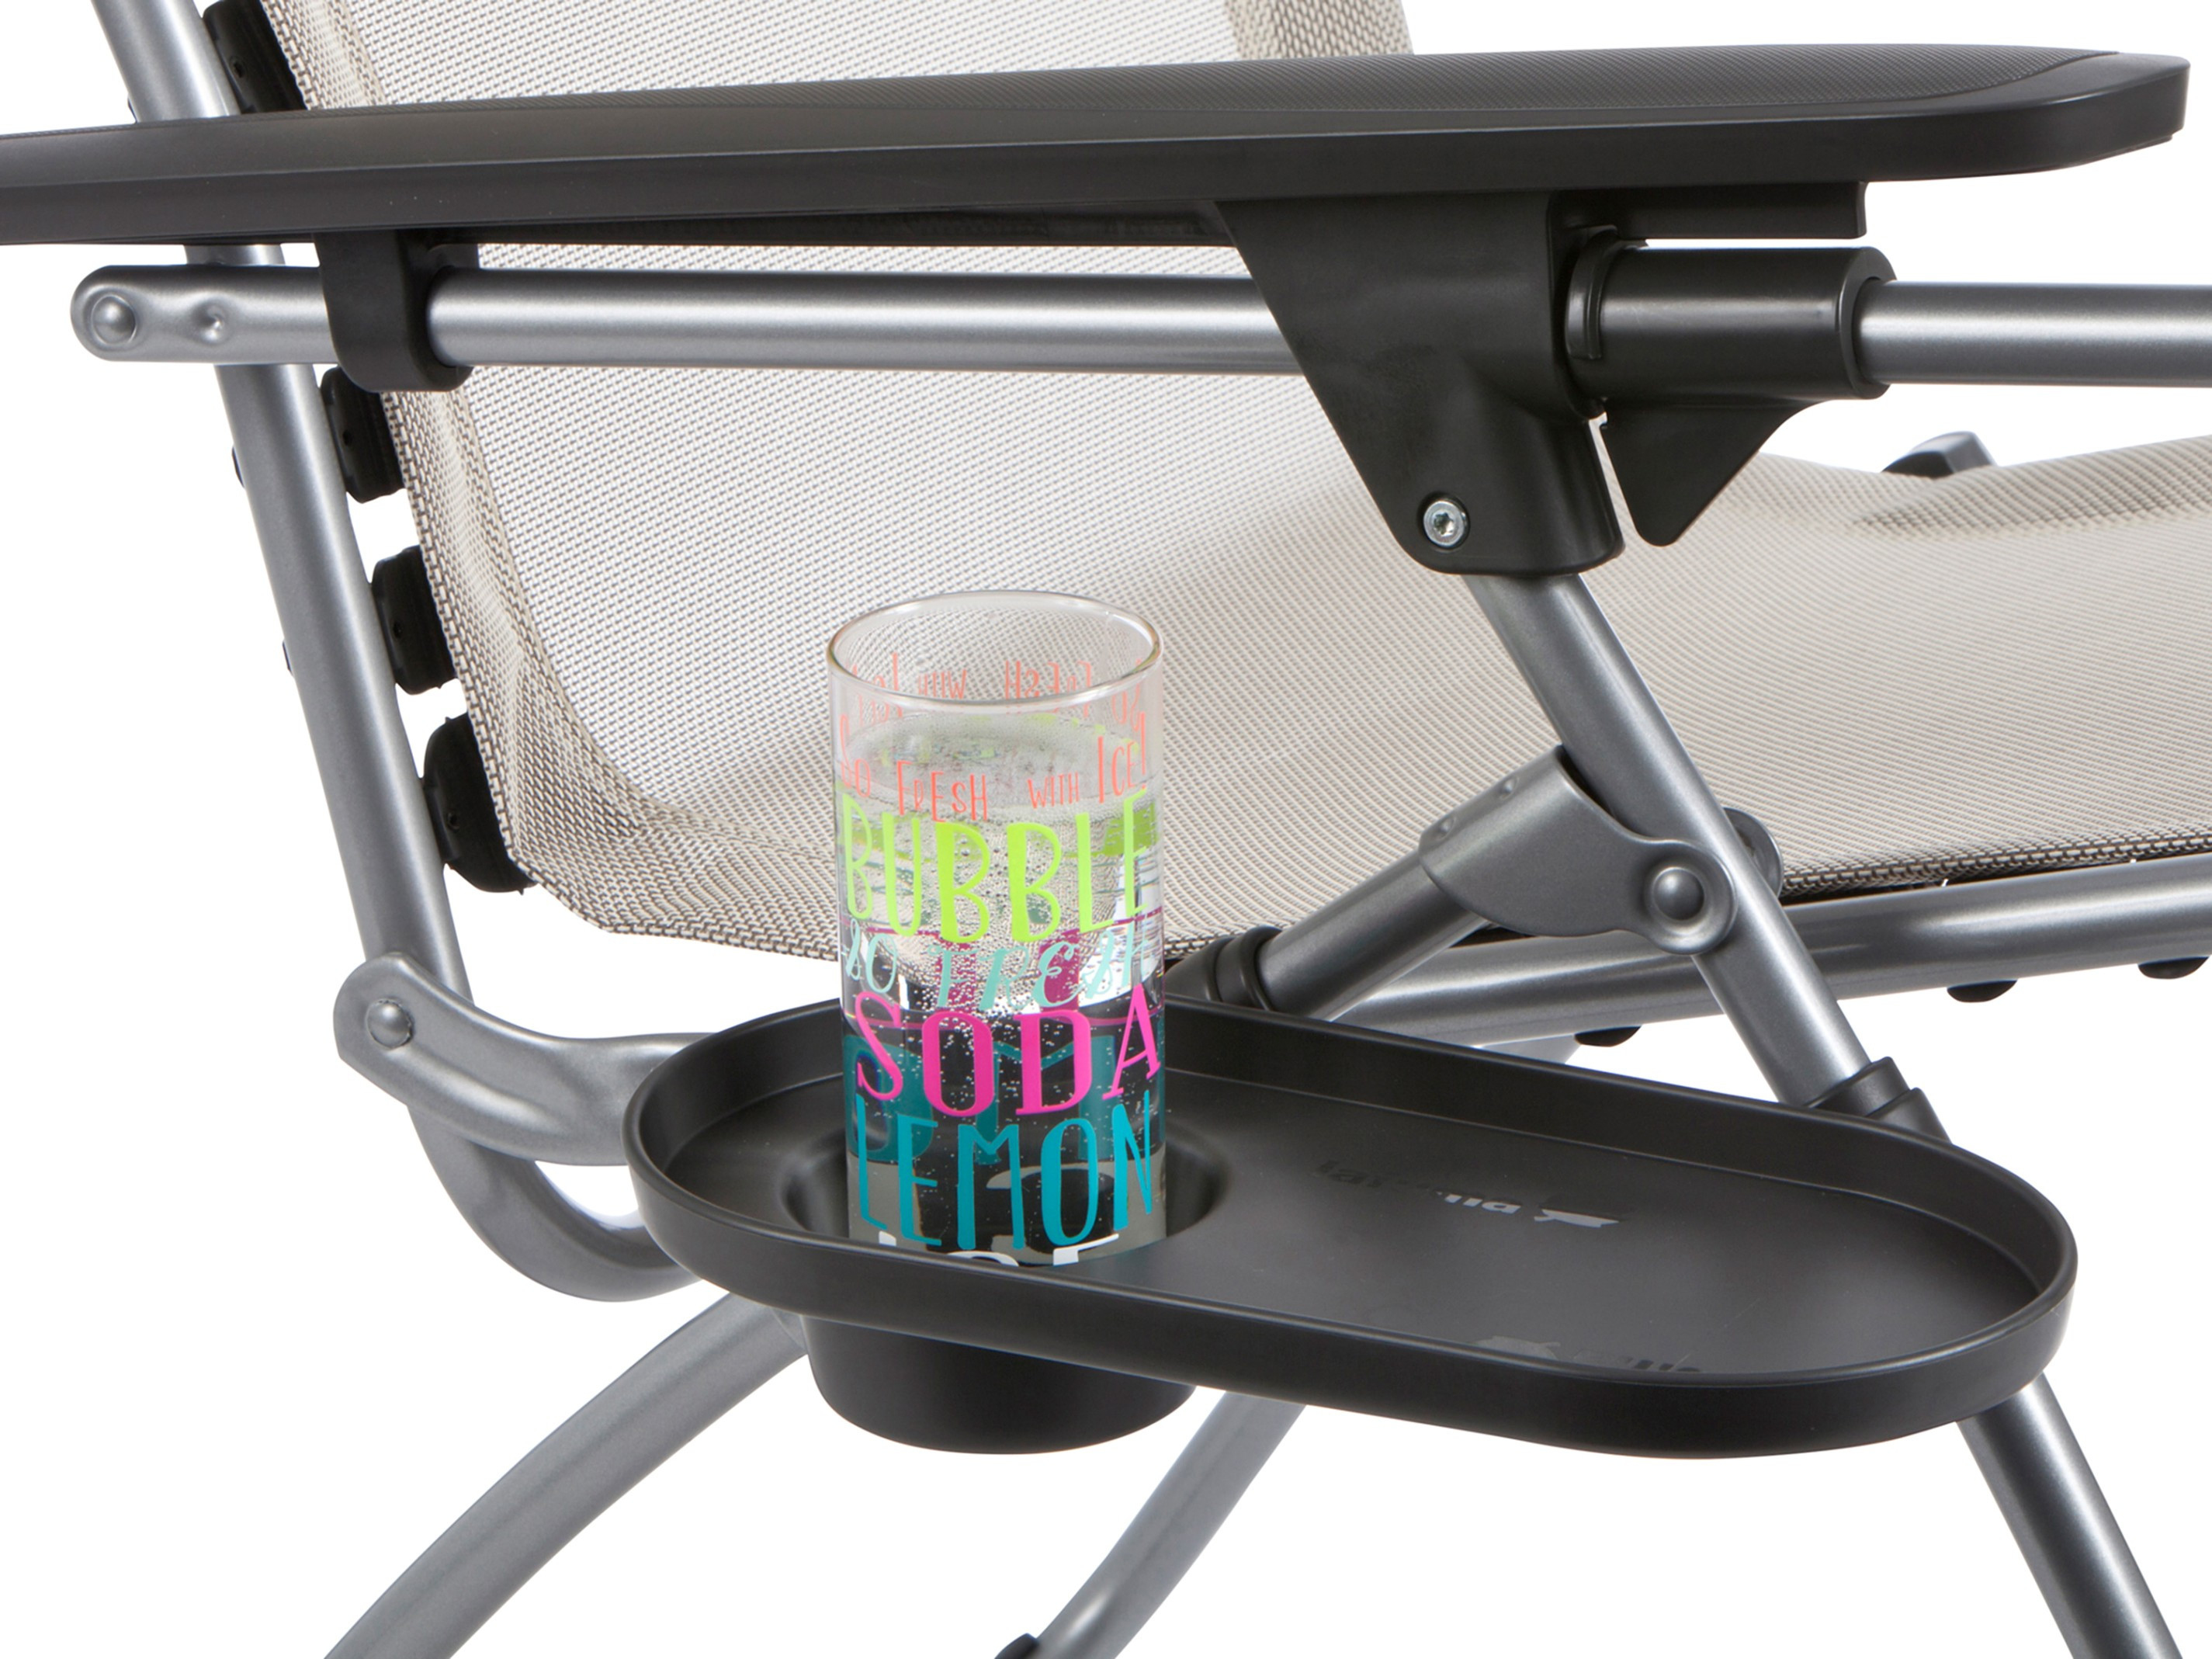 Table Kettler solde Beau Photos Table De Jardin Kettler Ainsi Que Confortable Kettler Lounge Mobel